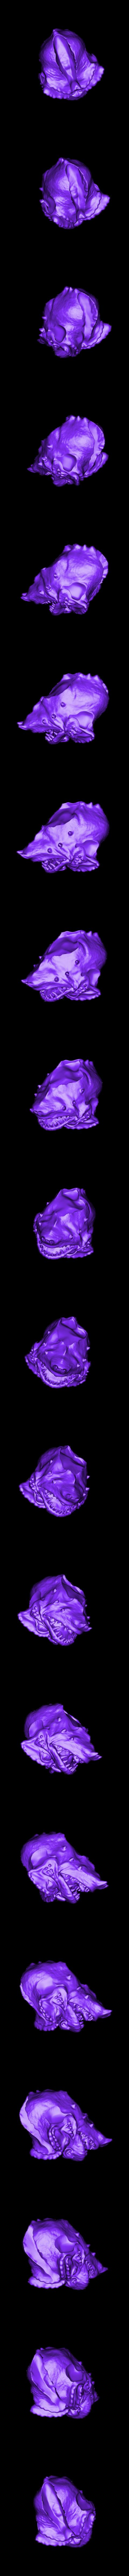 Stripe_head.stl Download free STL file Stripe Gremlin • 3D printer model, 3rdesignworks